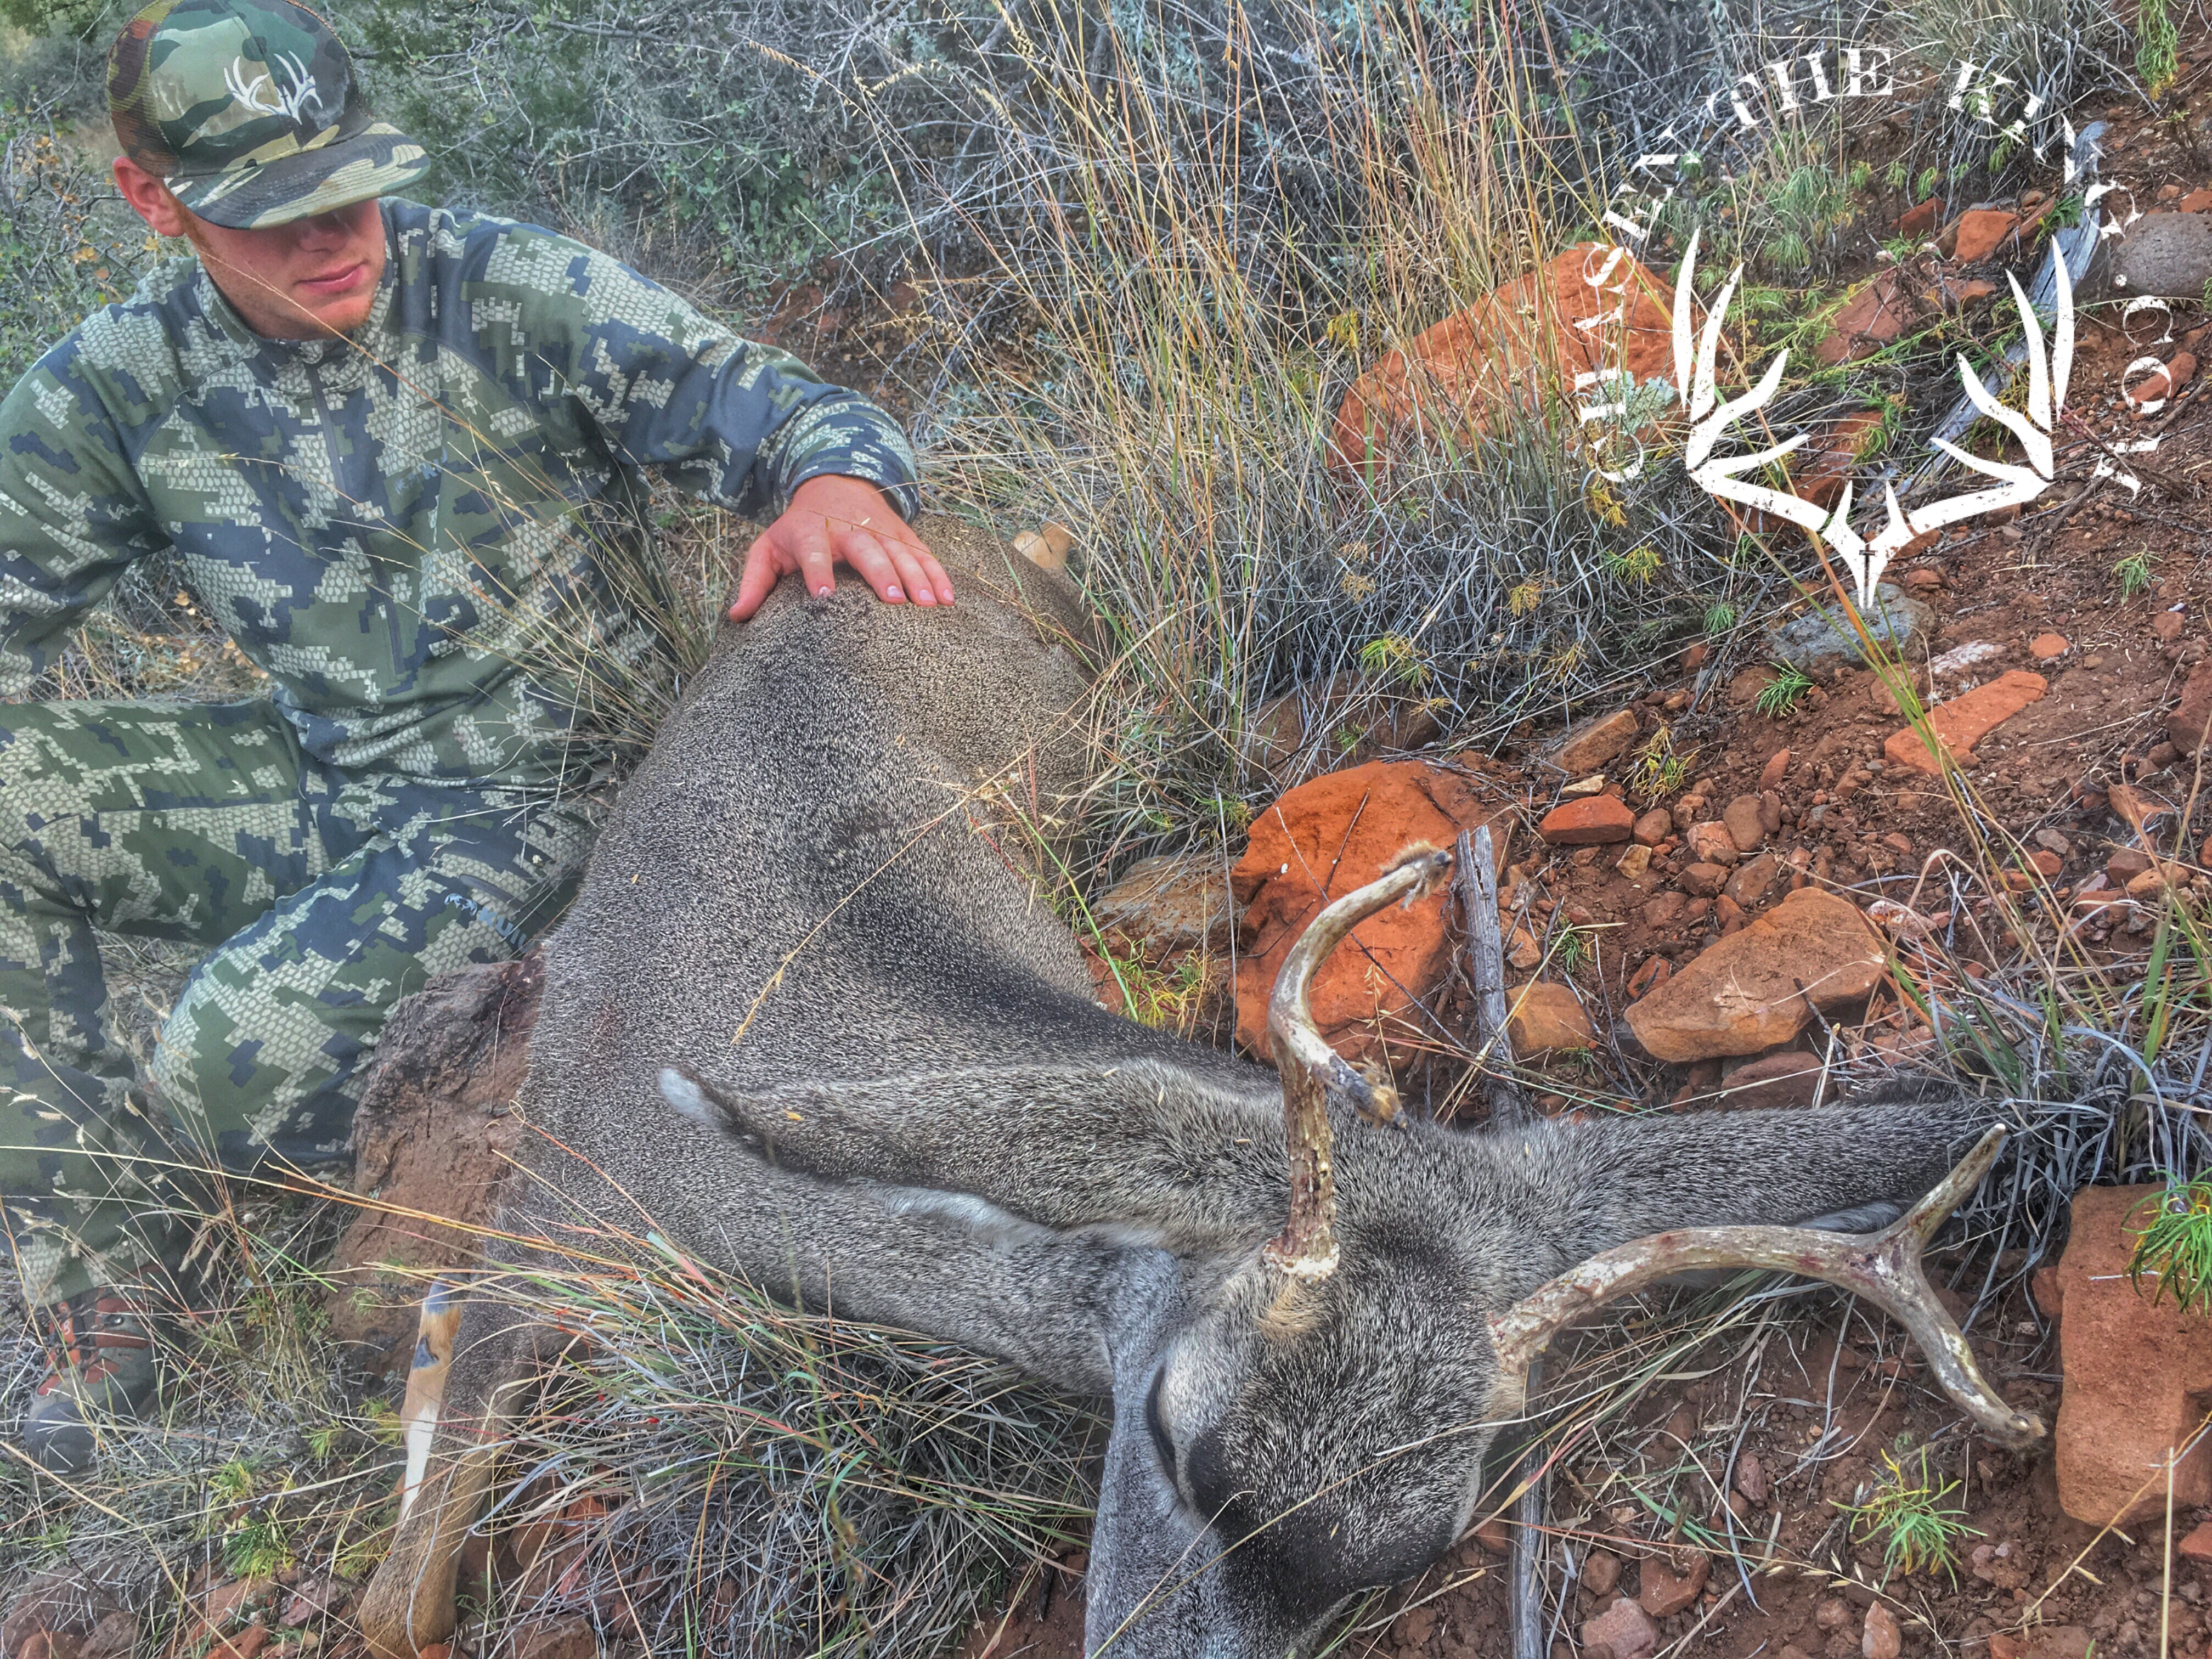 Unit 6B muzzleloader mule deer 1